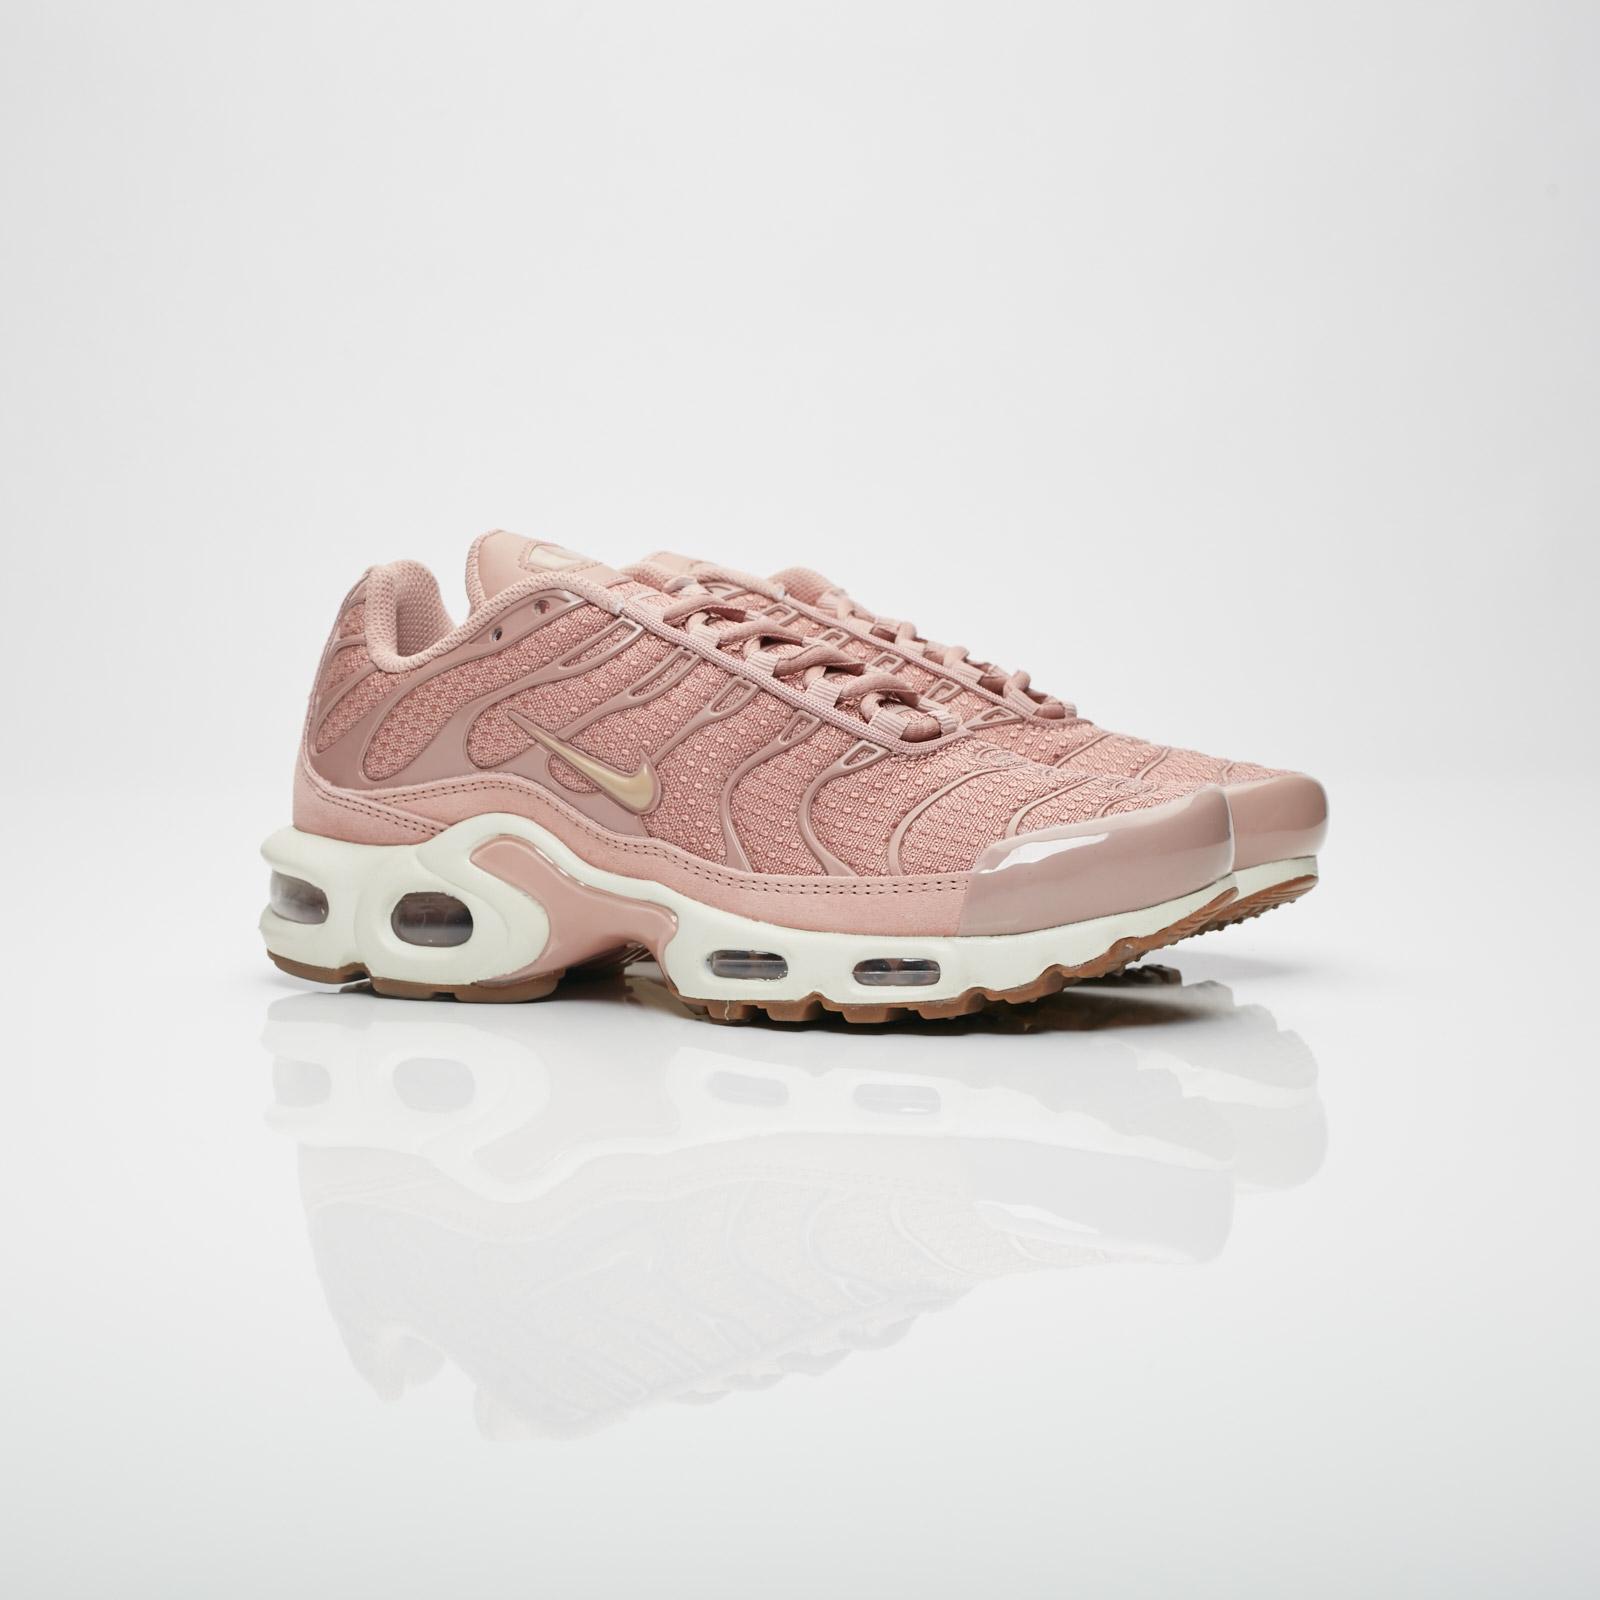 Nike Wmns Air Max Plus 605112 603 Sneakersnstuff I